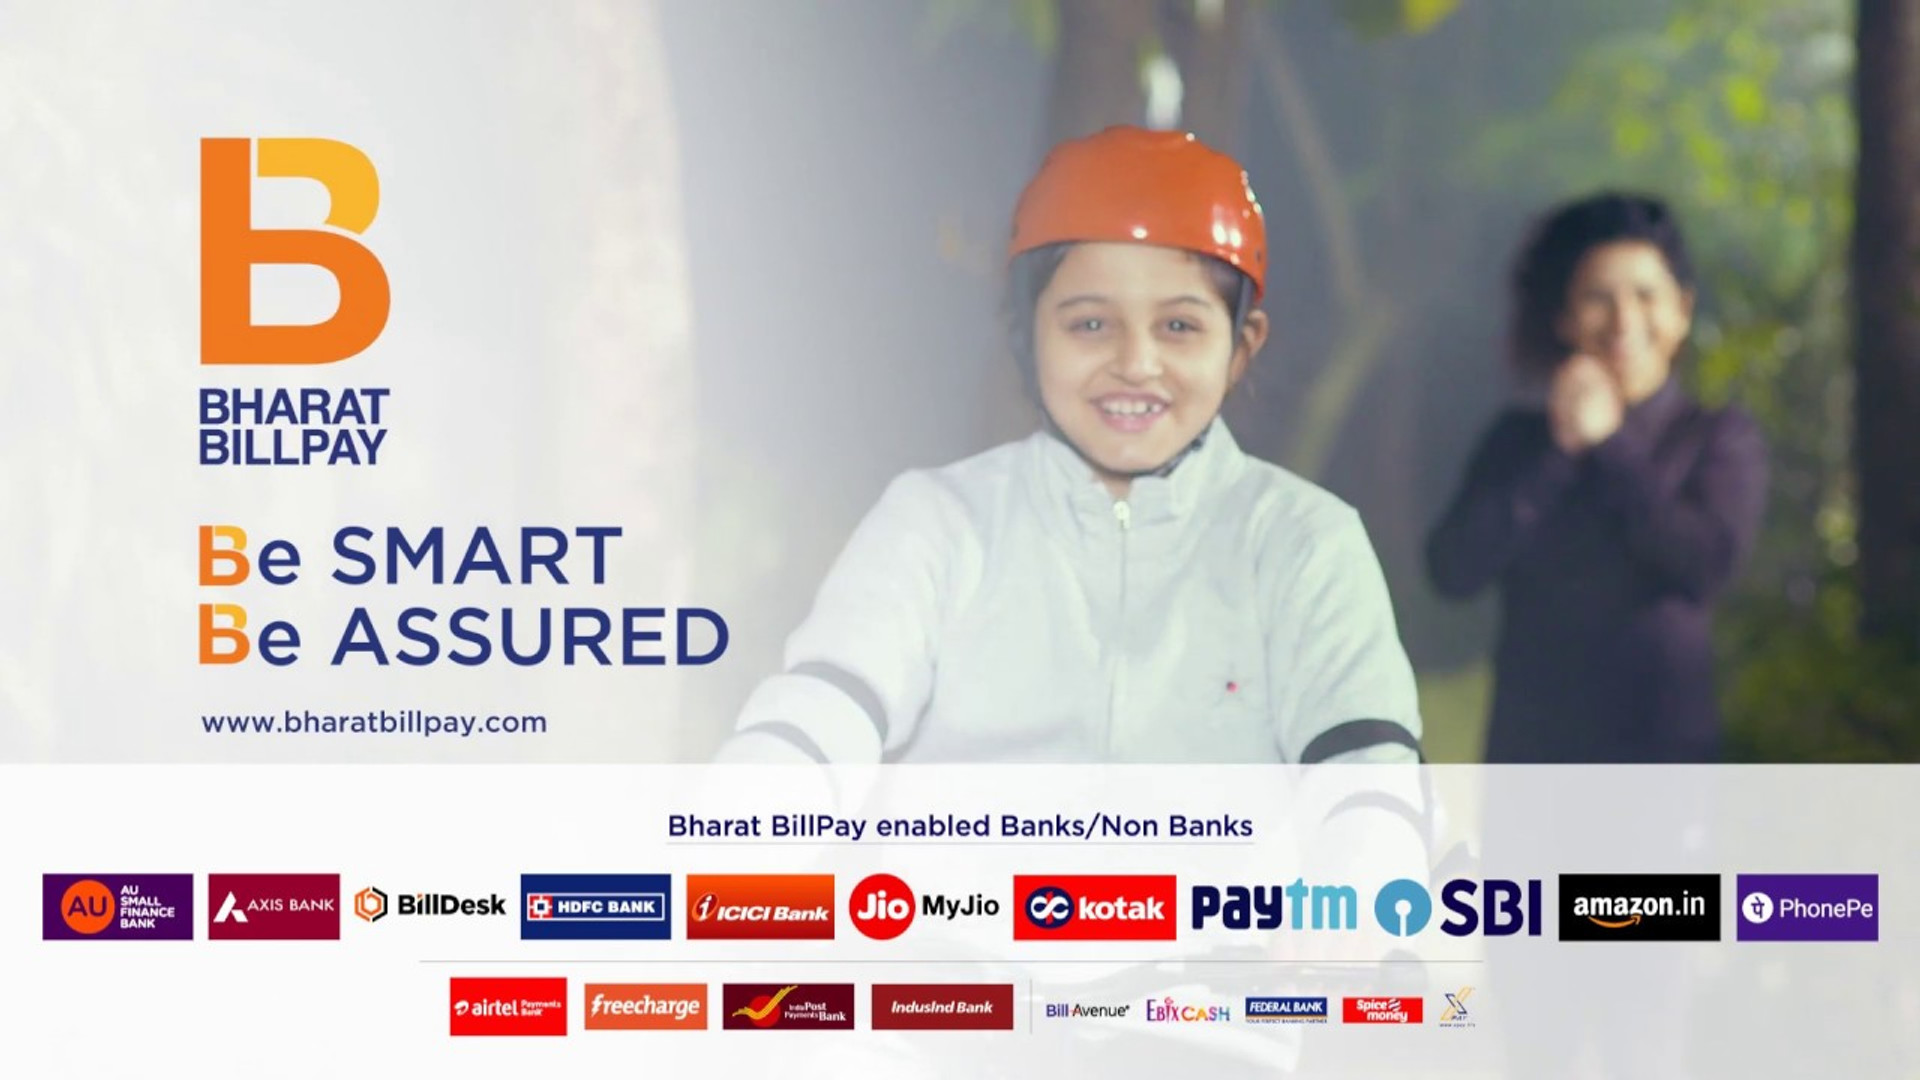 Be Assured, Bharat BillPay Ad Film